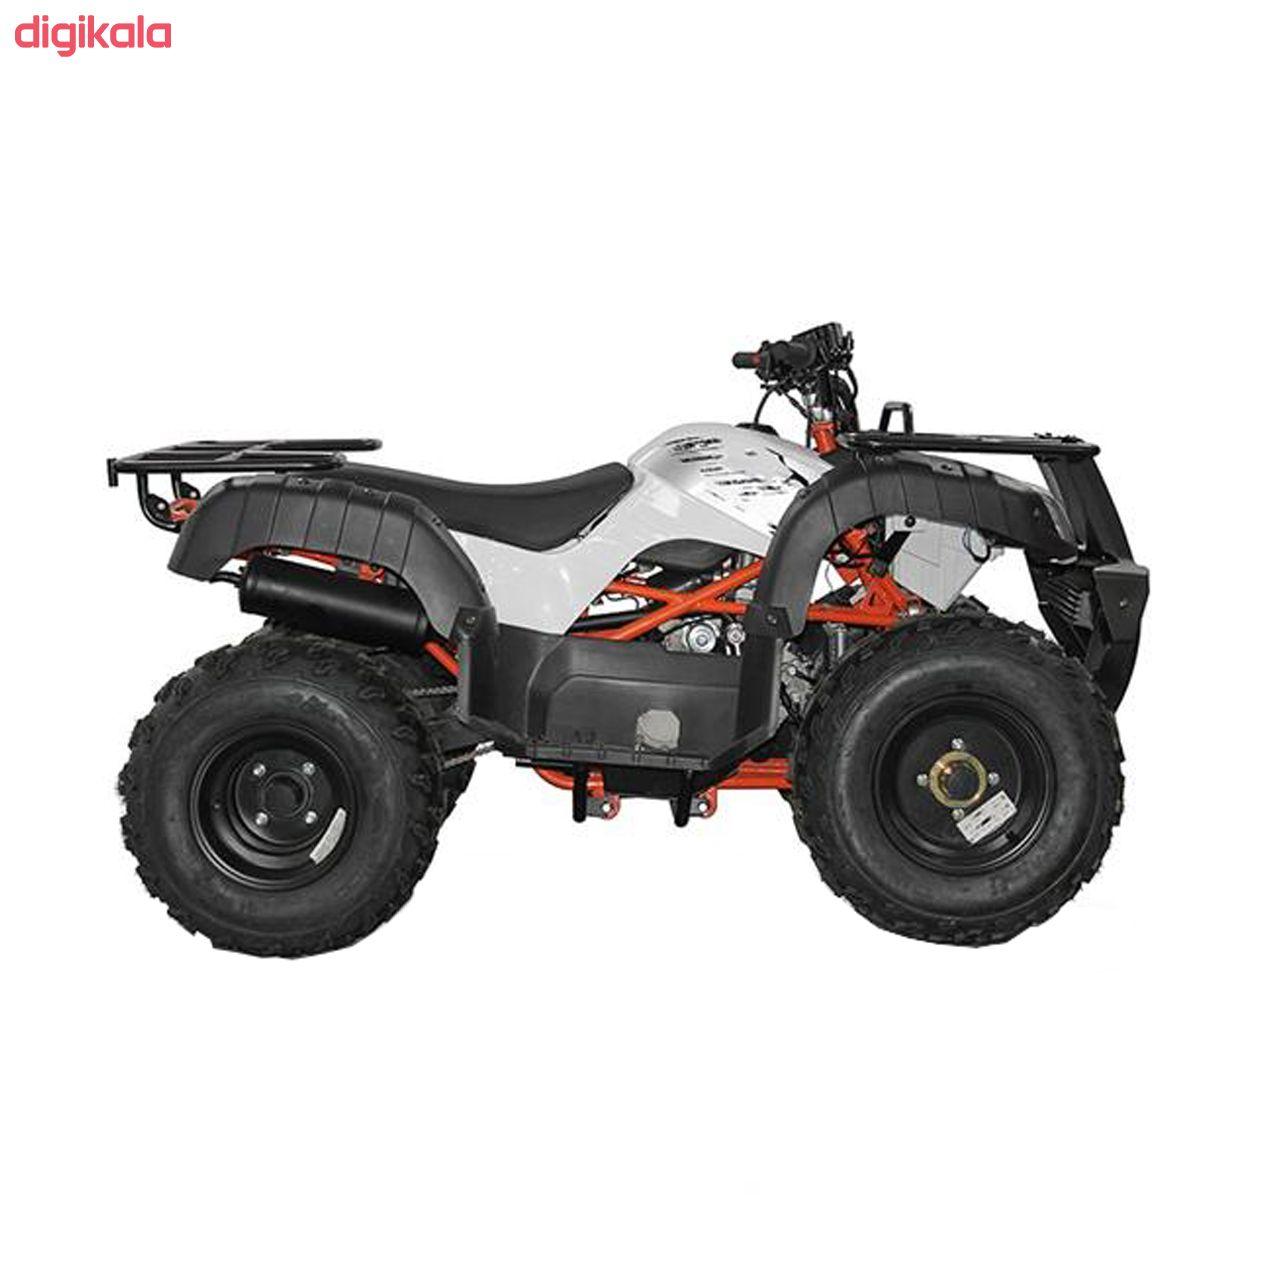 موتورسیکلت کویر مدل 150X2  سی سی سال 1399 main 1 2